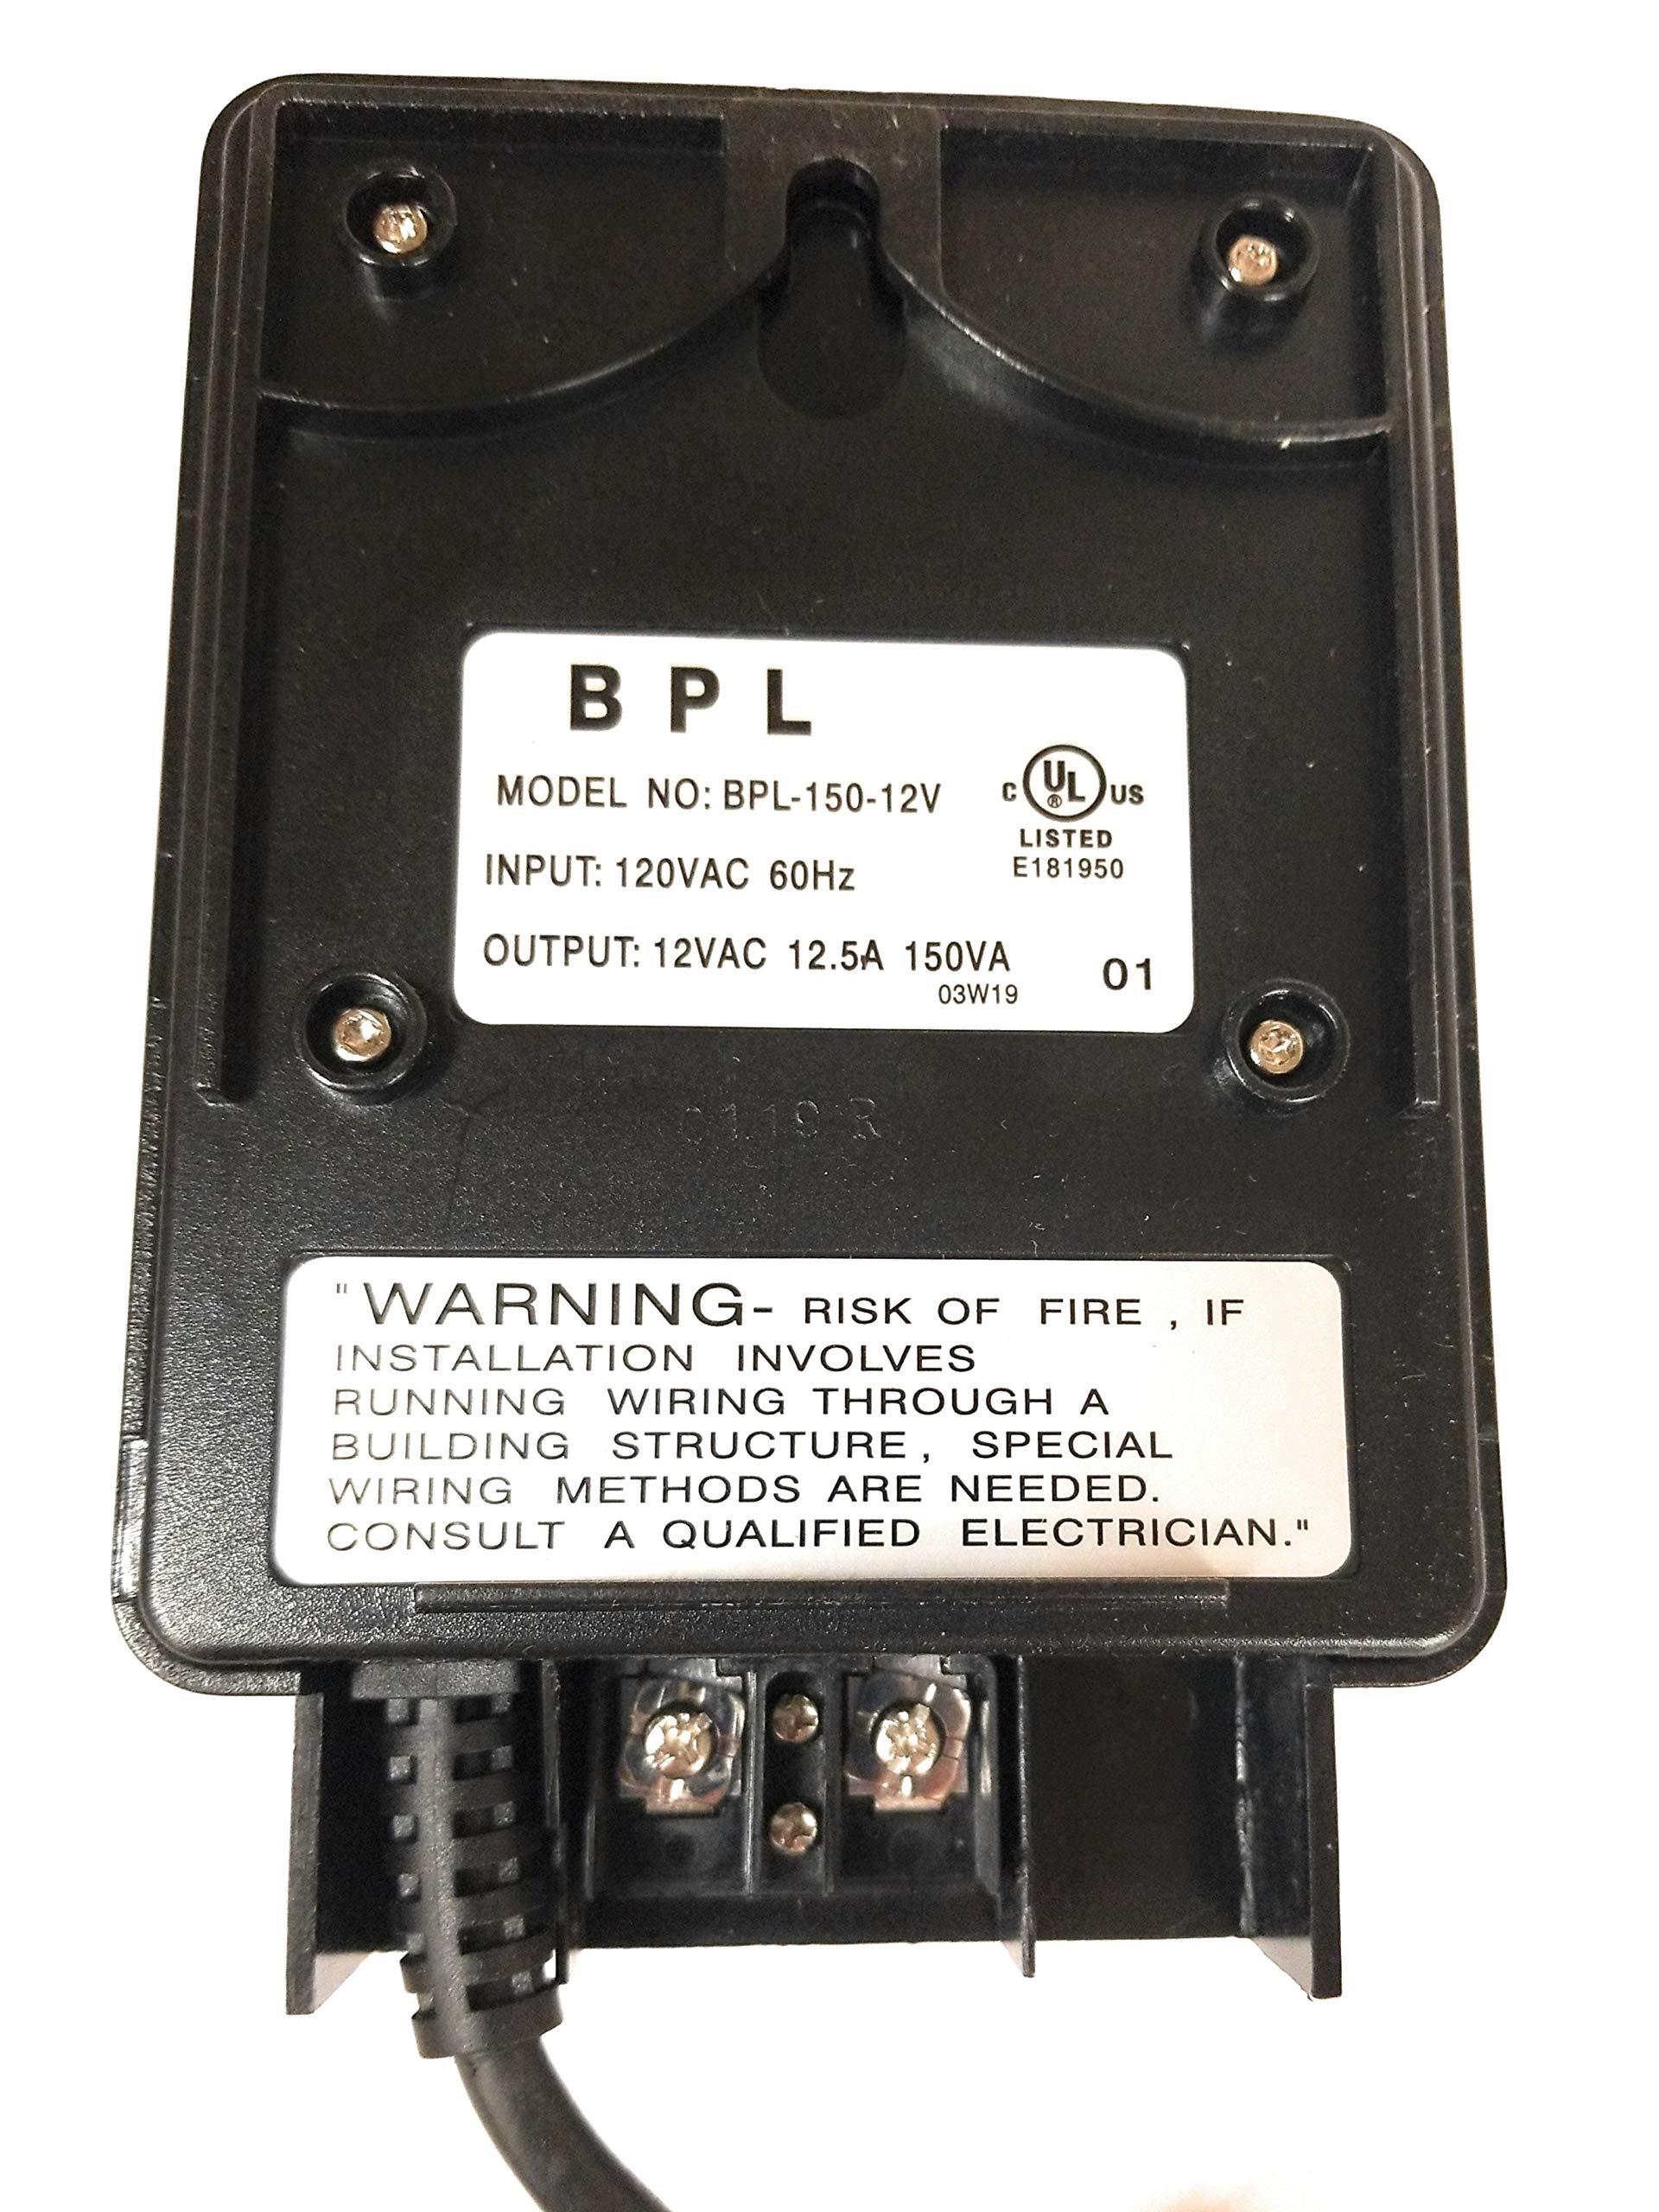 Best Pro Lighting 150 Watt Black Plastic Transformer by Best Pro Lighting